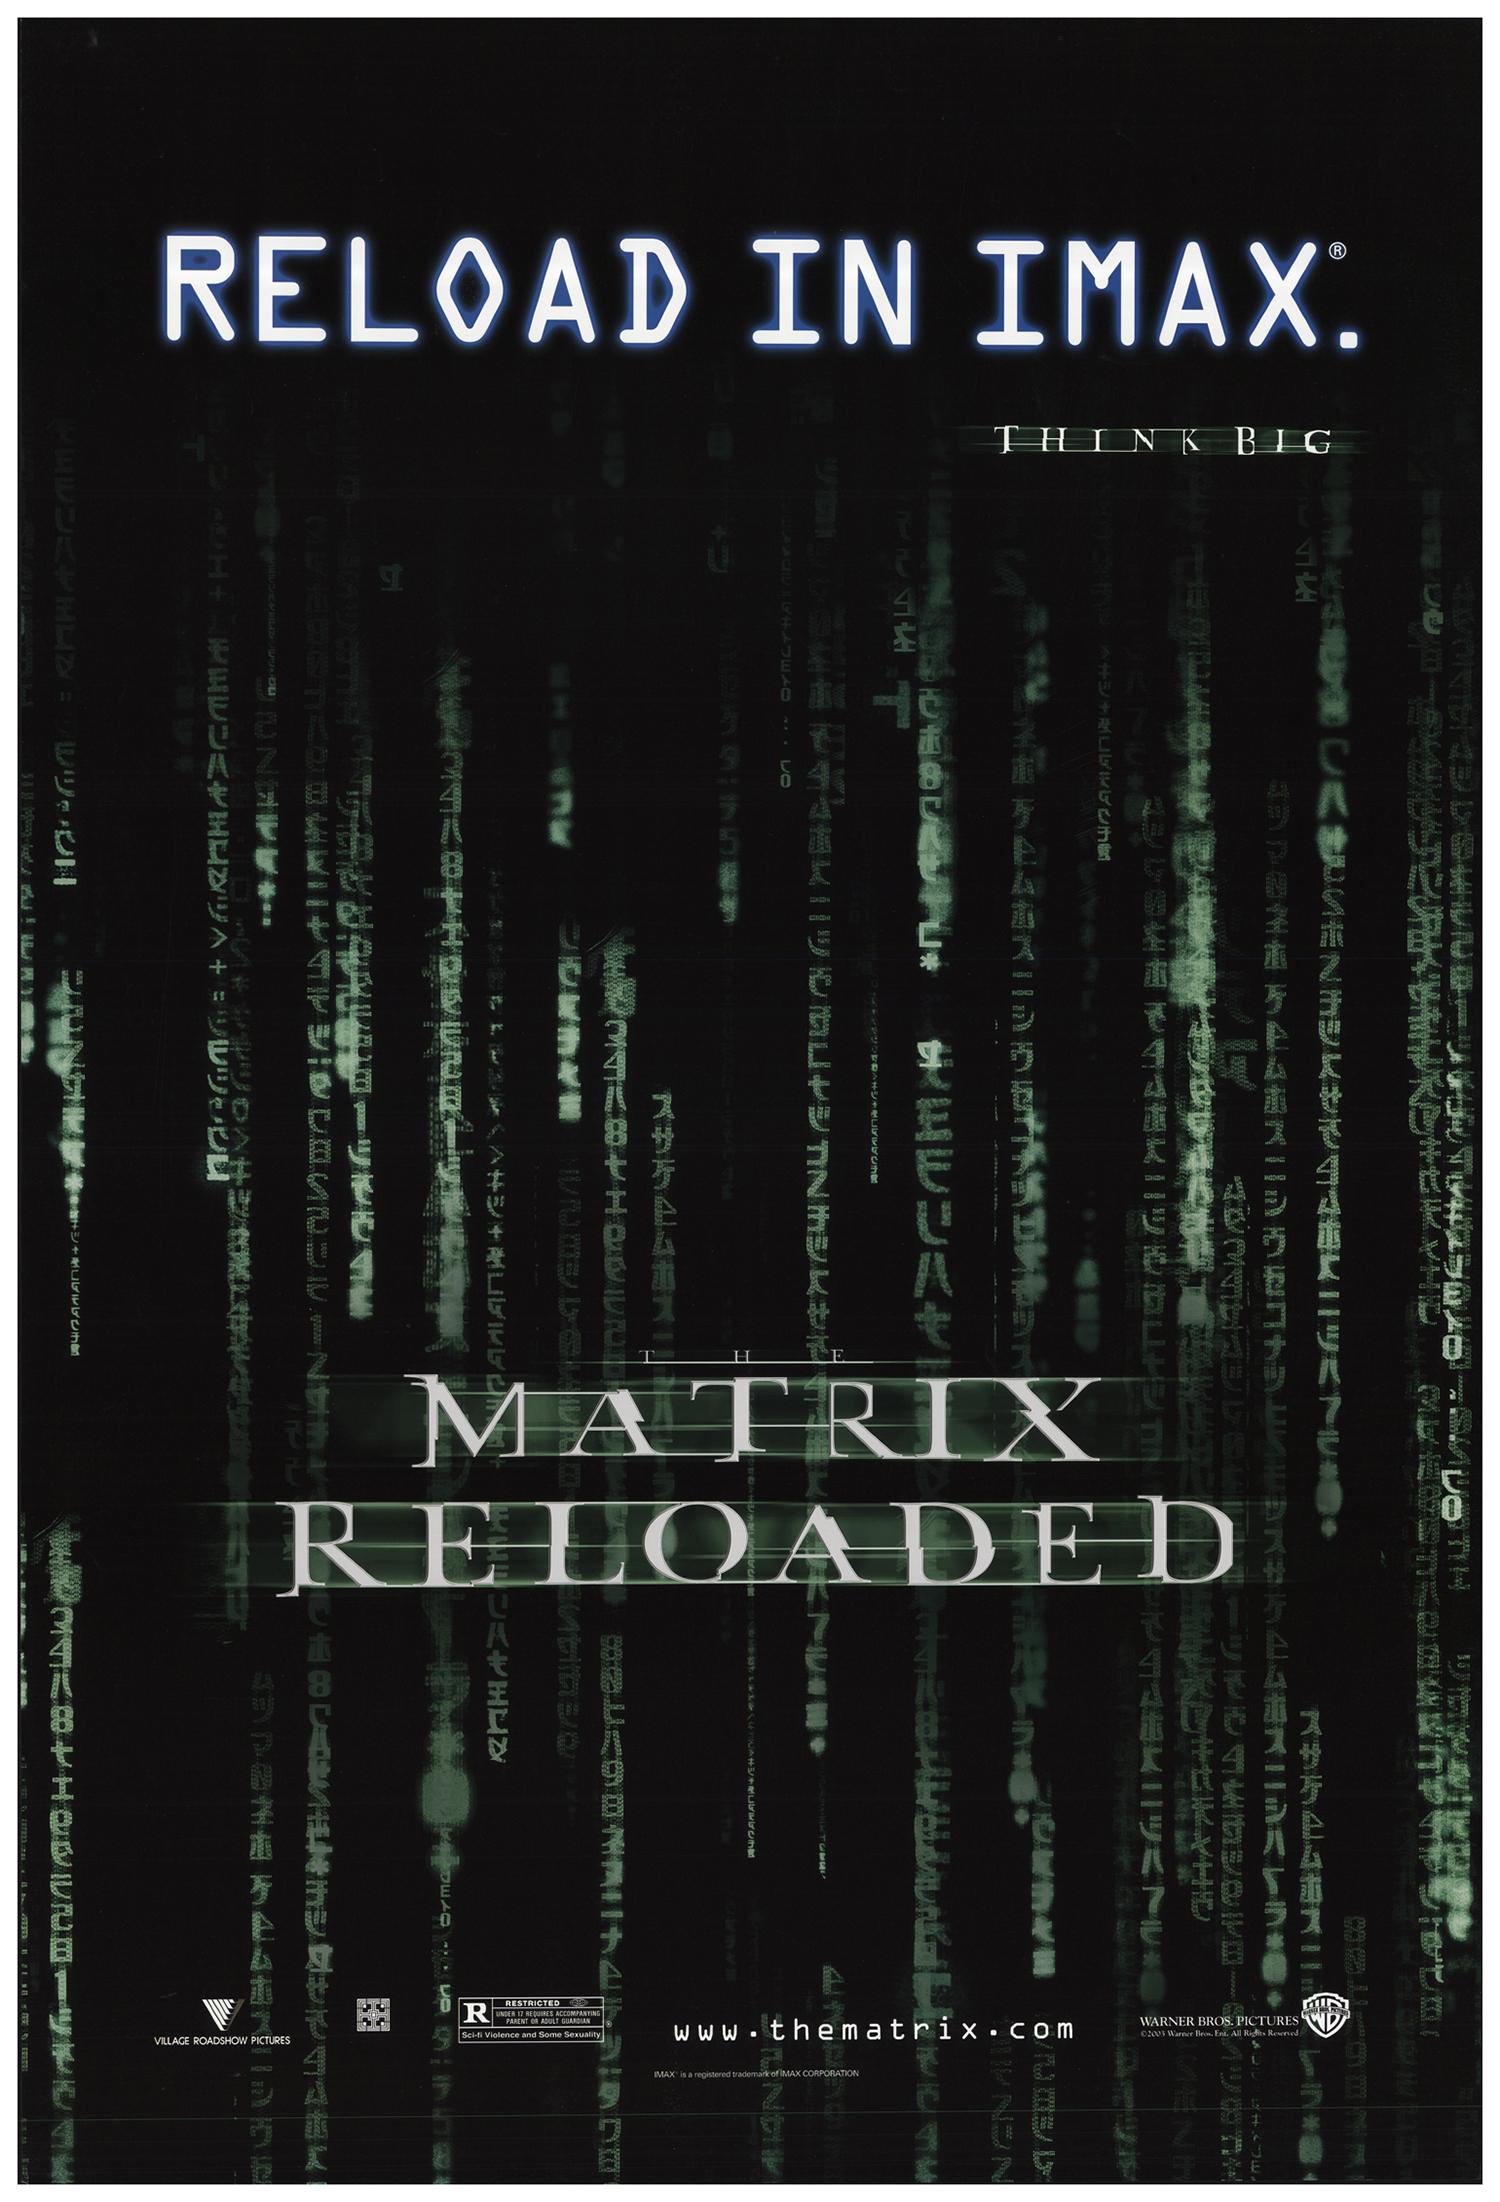 Matrix Reloaded, The 2003 Original Movie Poster #FFF-67233 ...